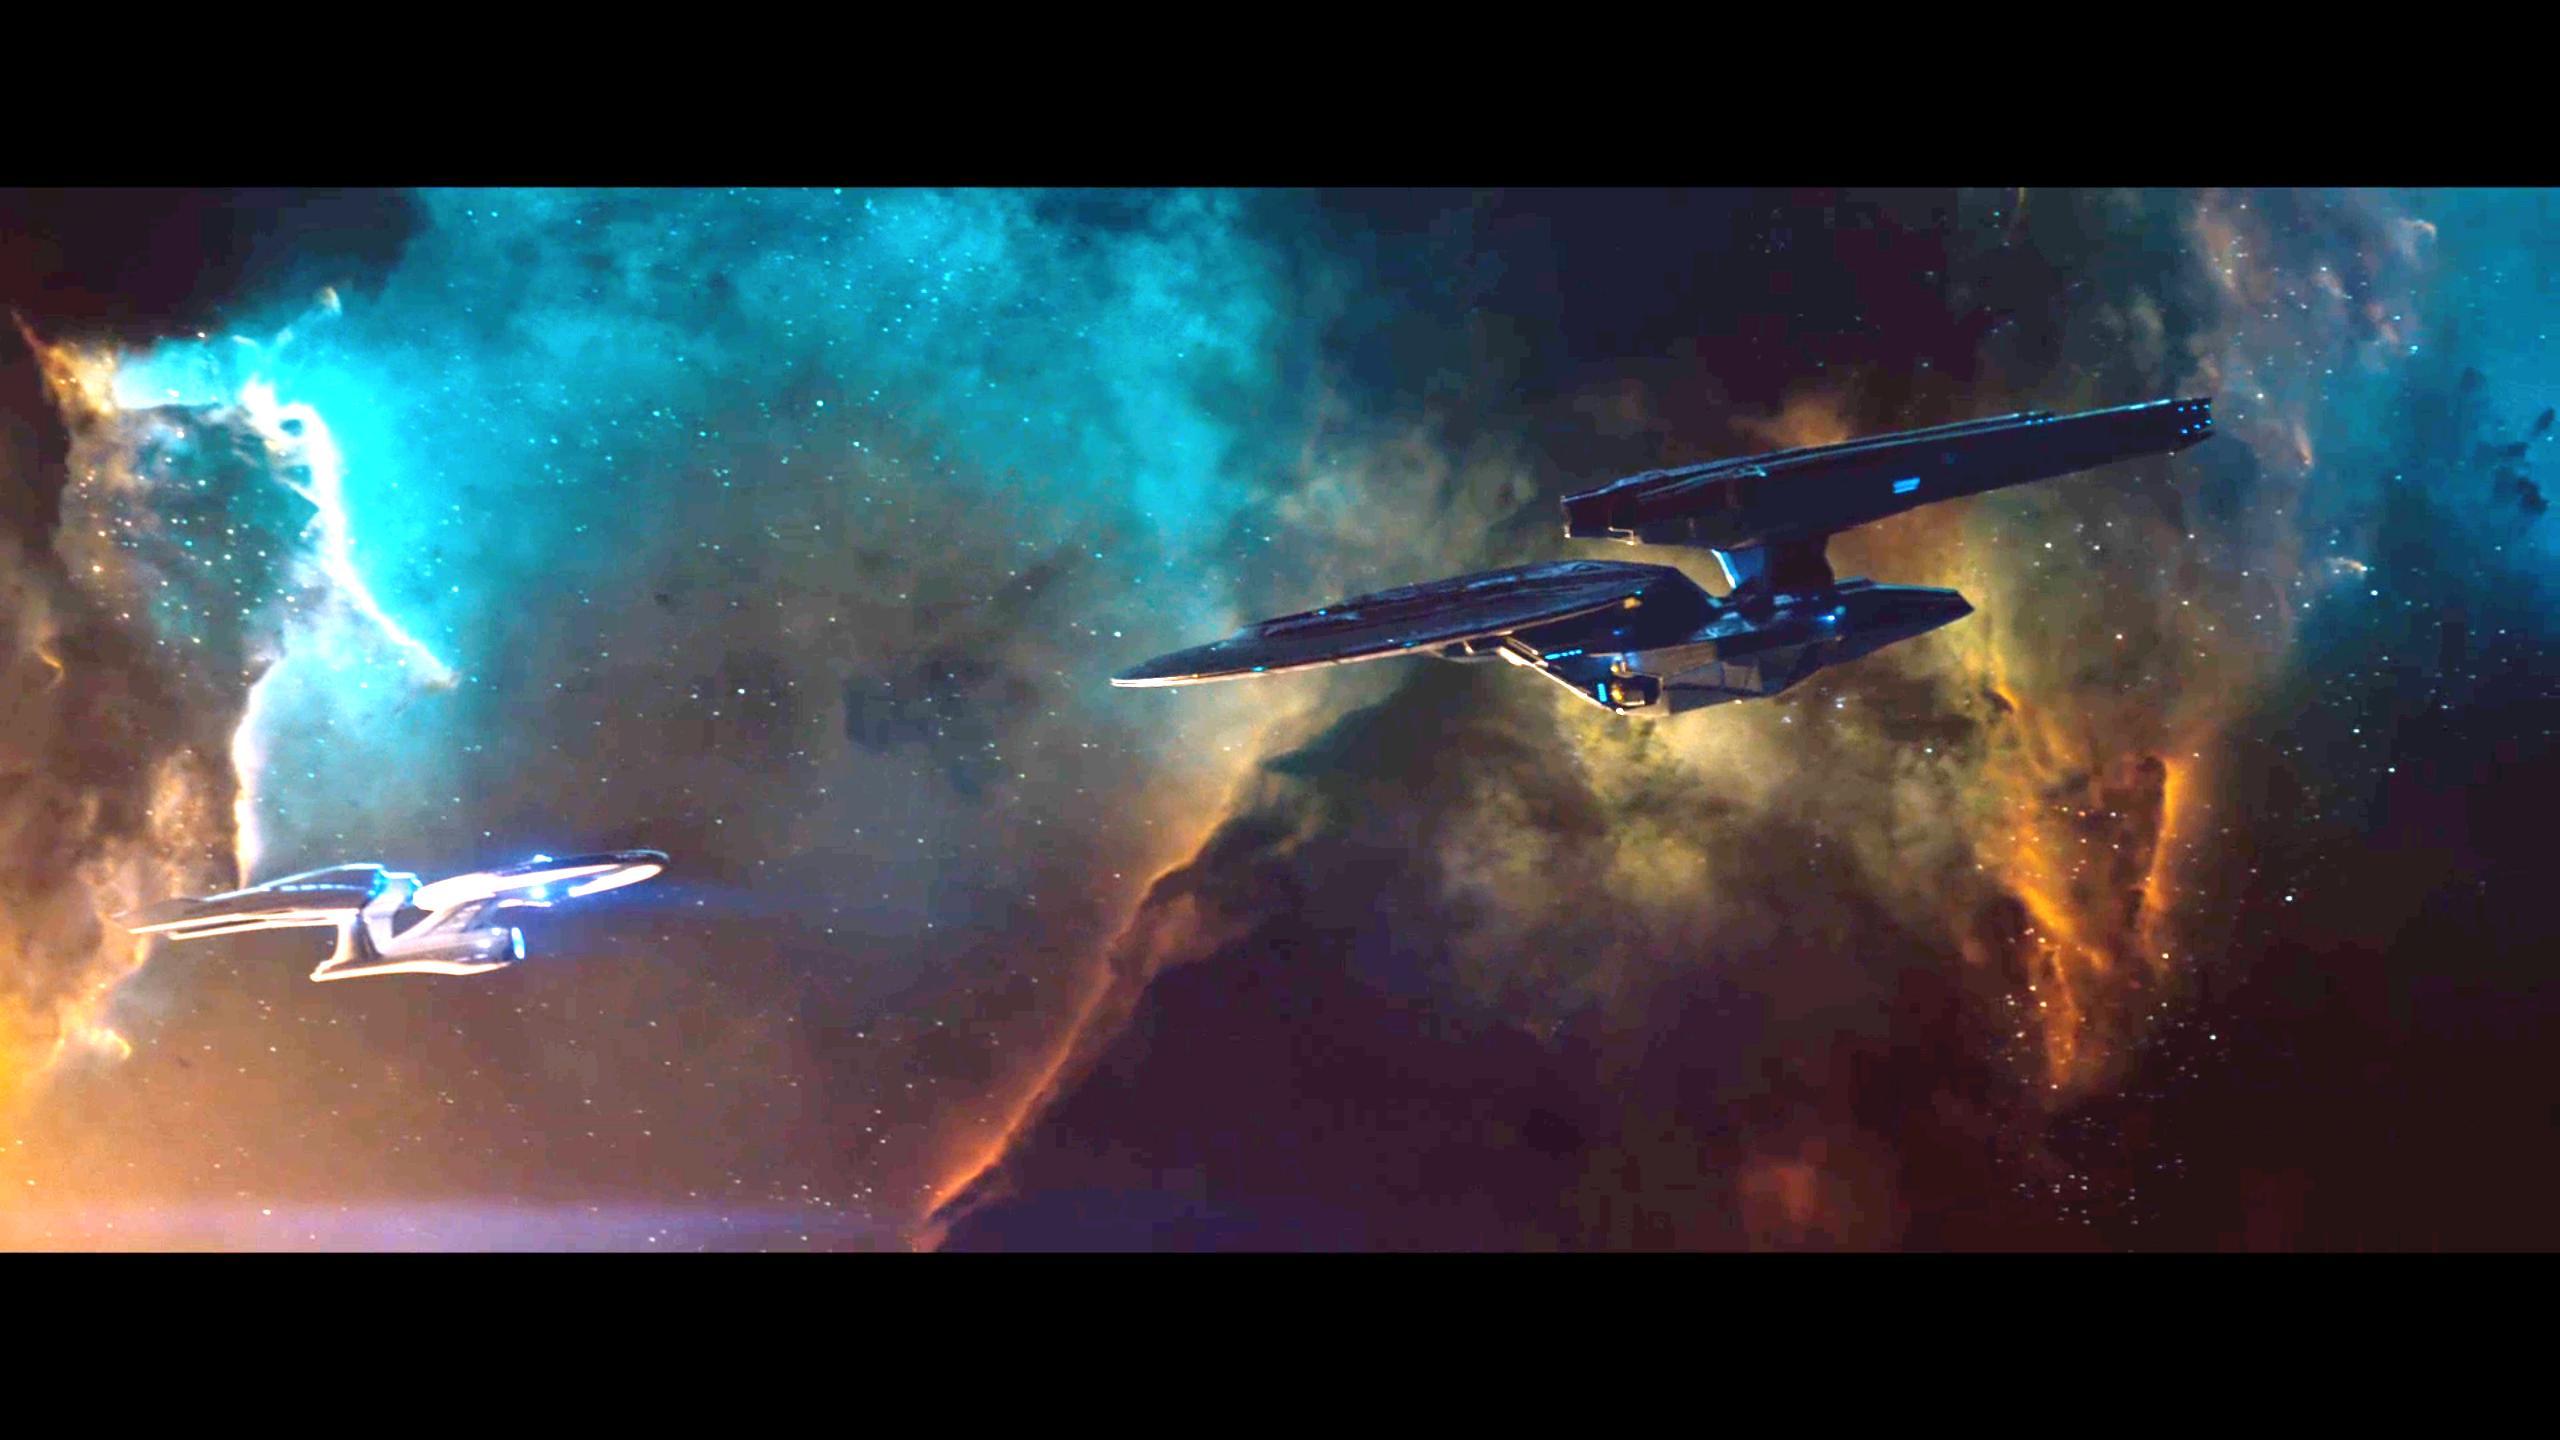 Star Trek Into Darkness HD Wallpapers Backgrounds 2560x1440